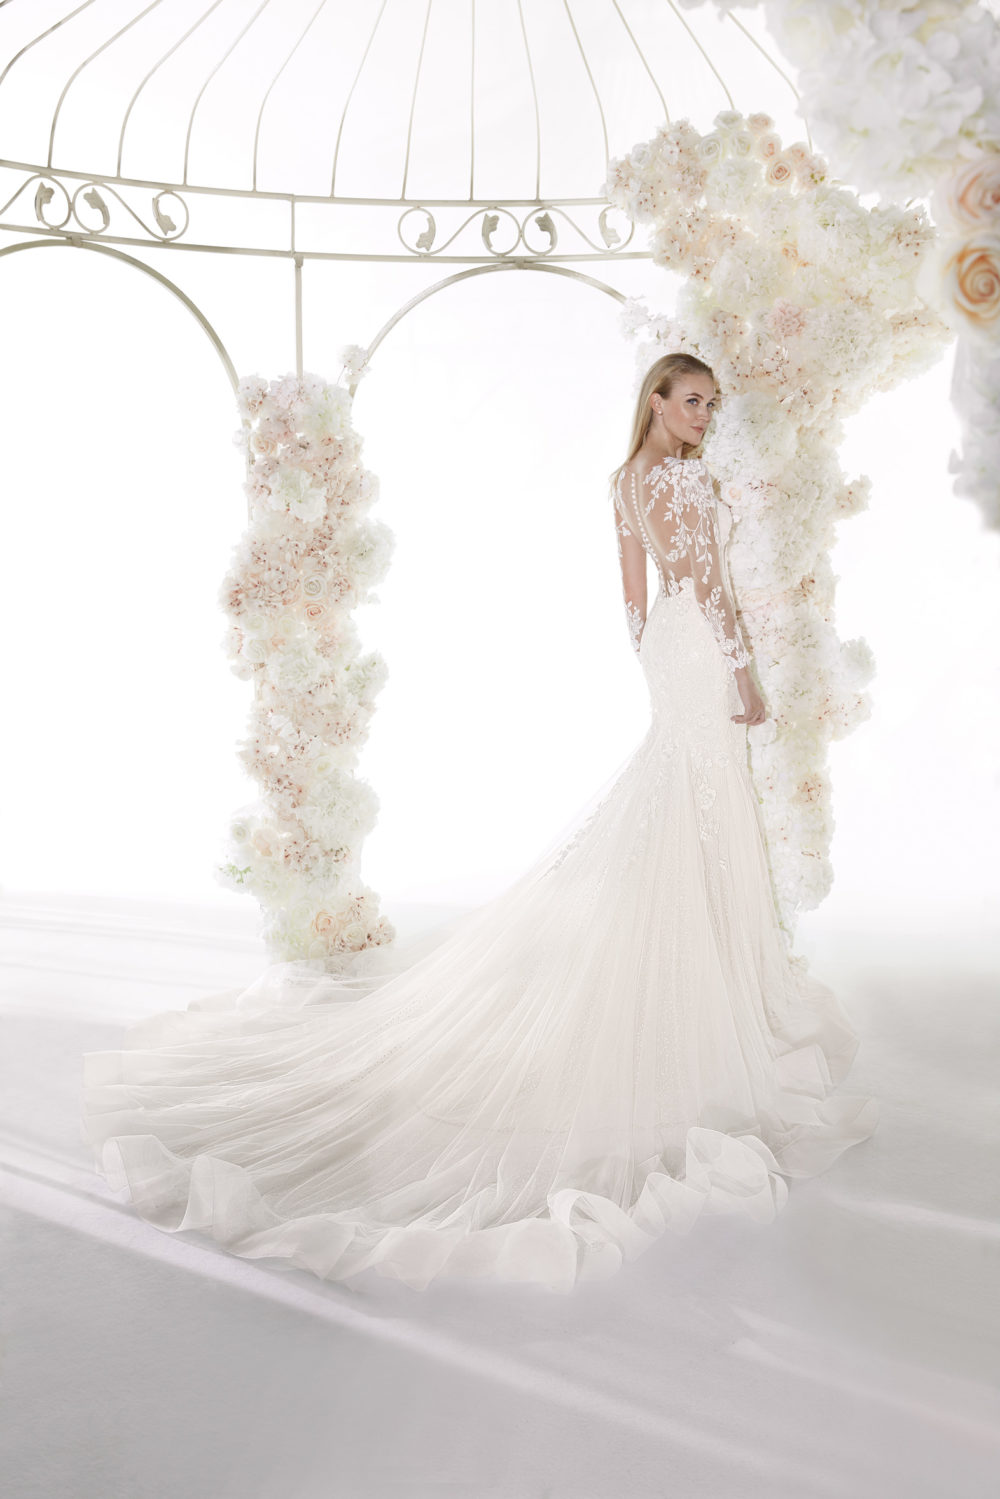 Mariages: abito da sposa Colet 2020 a Vicenza, Verona, Padova, Veneto COA20291